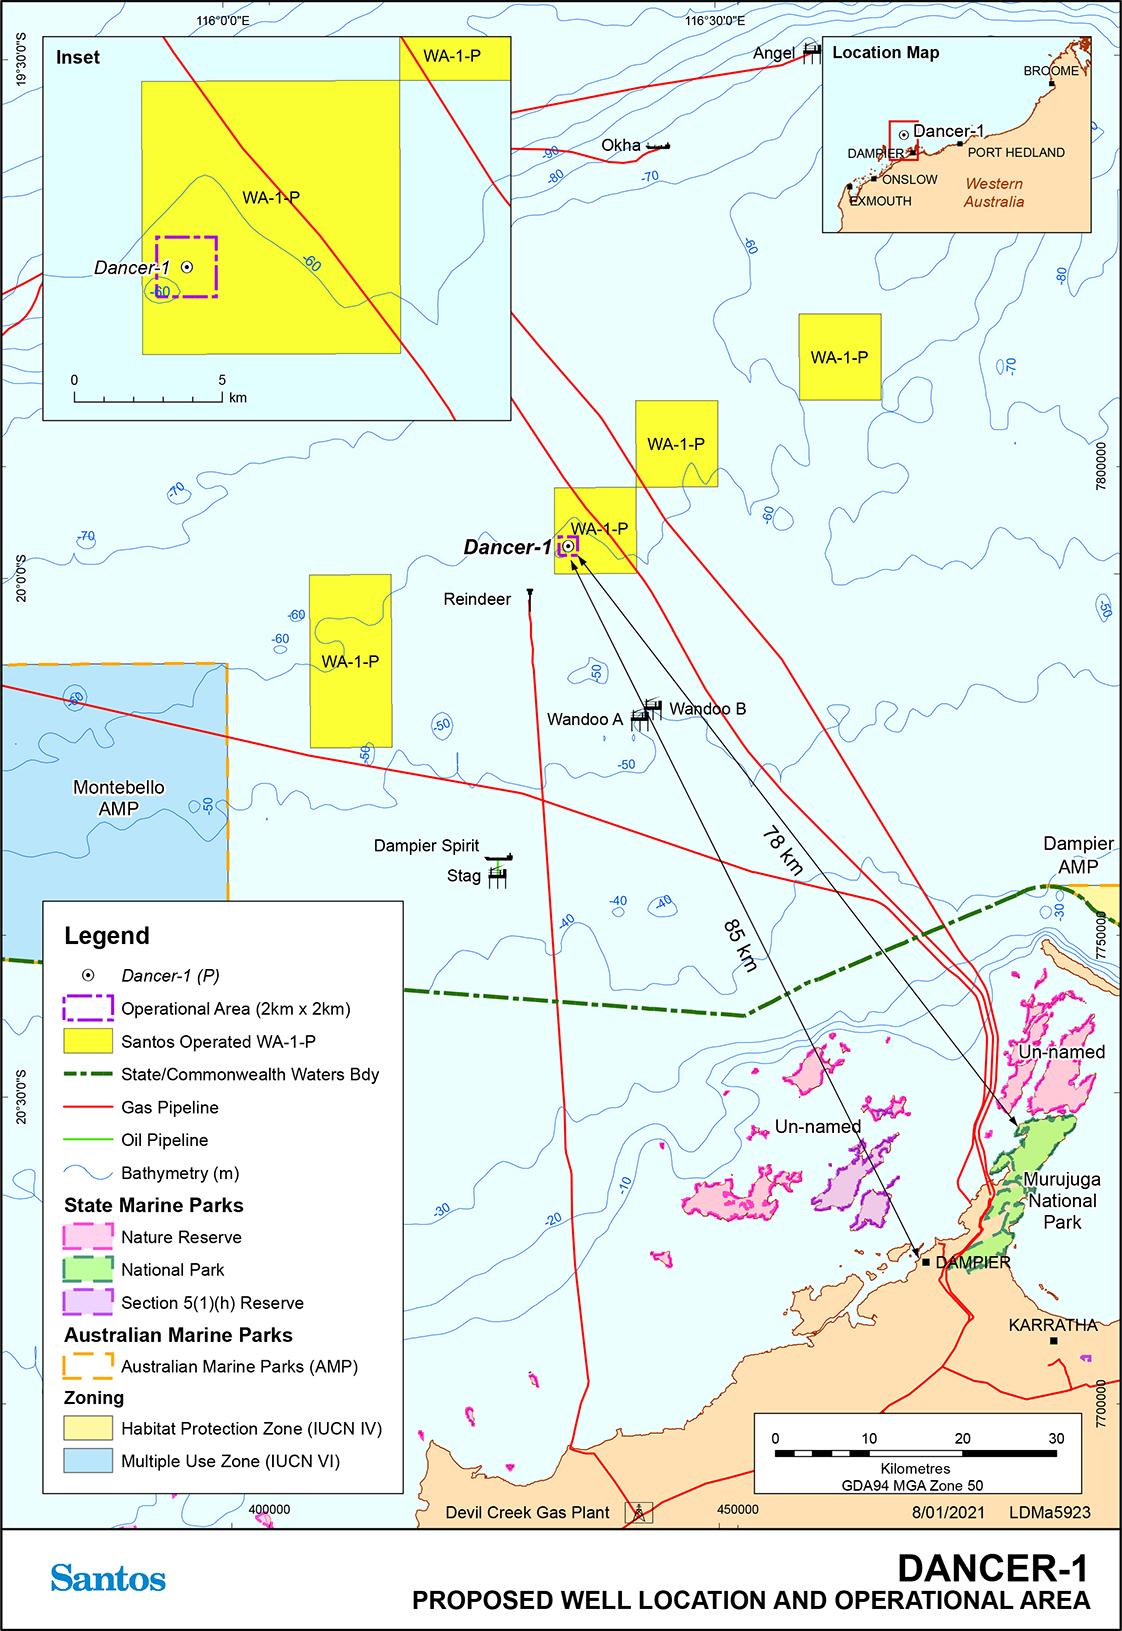 Location map - Activity: Dancer-1 Exploration Drilling  (refer to description)